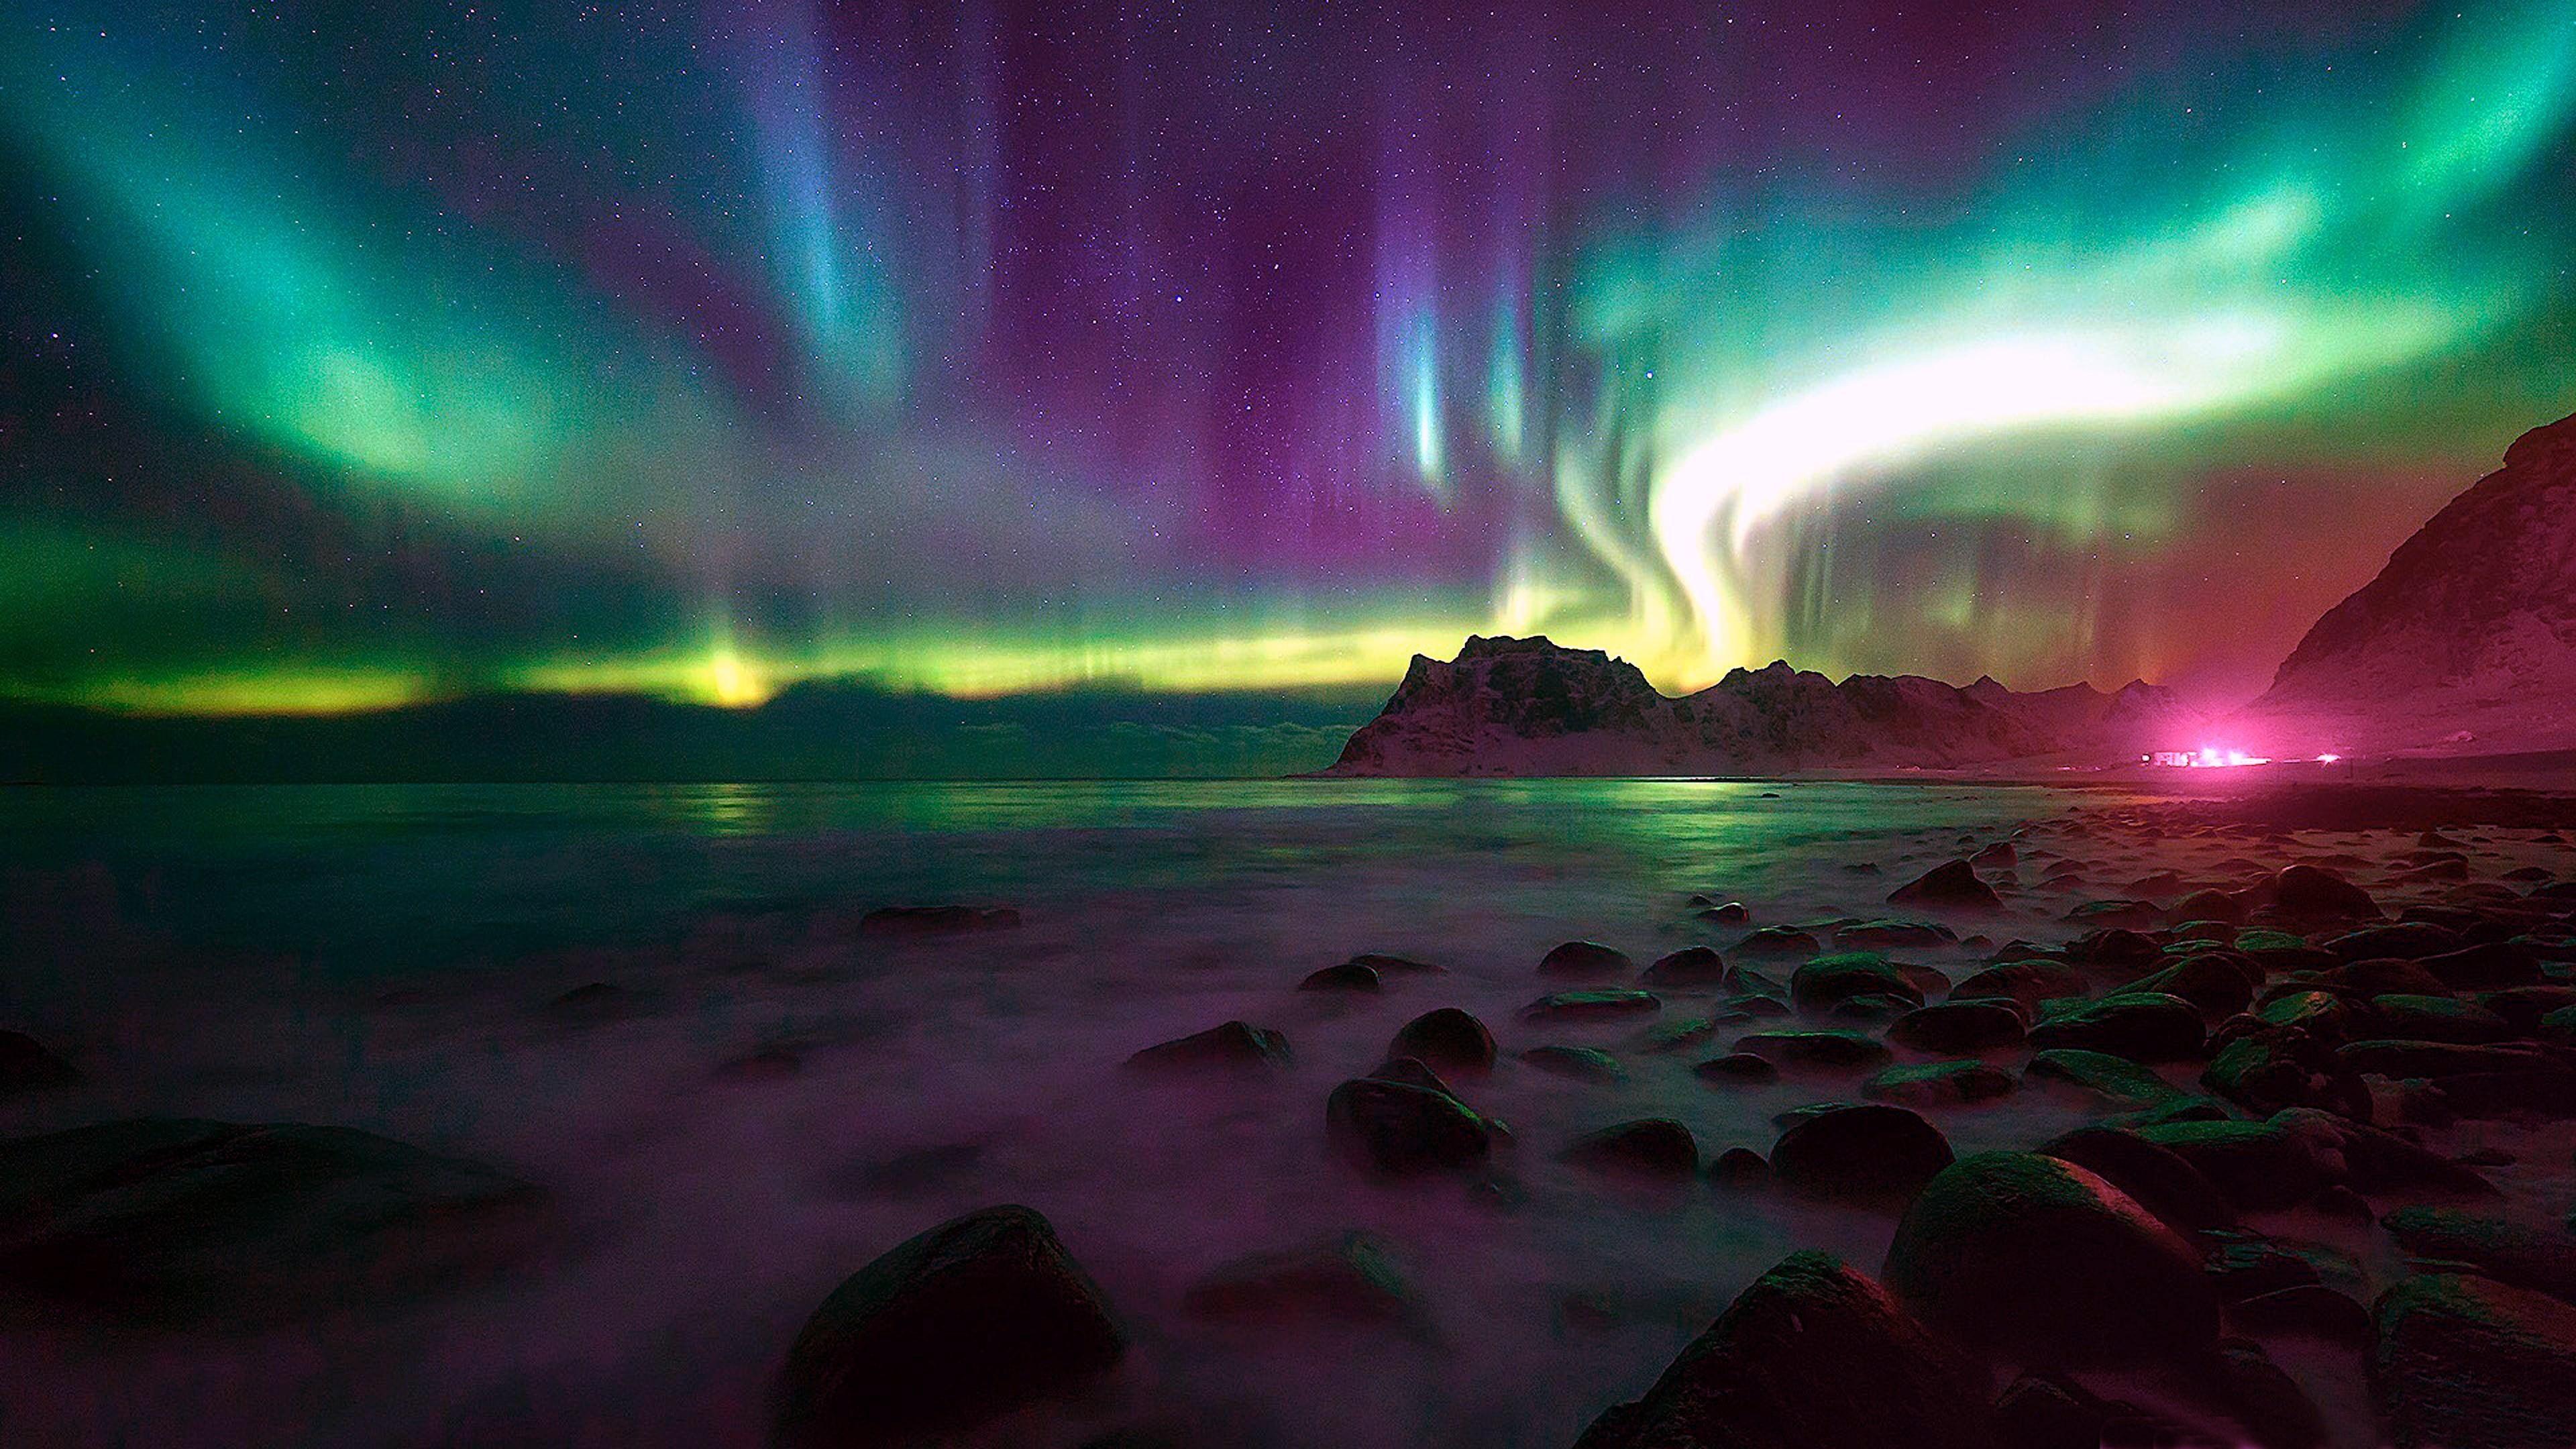 Green Sky Aurora Borealis Night Northern Lights Norway Lofoten Starry Night 4k Wallpaper Hdwallpaper Desktop Sunrise Wallpaper Green Sky Hd Wallpaper